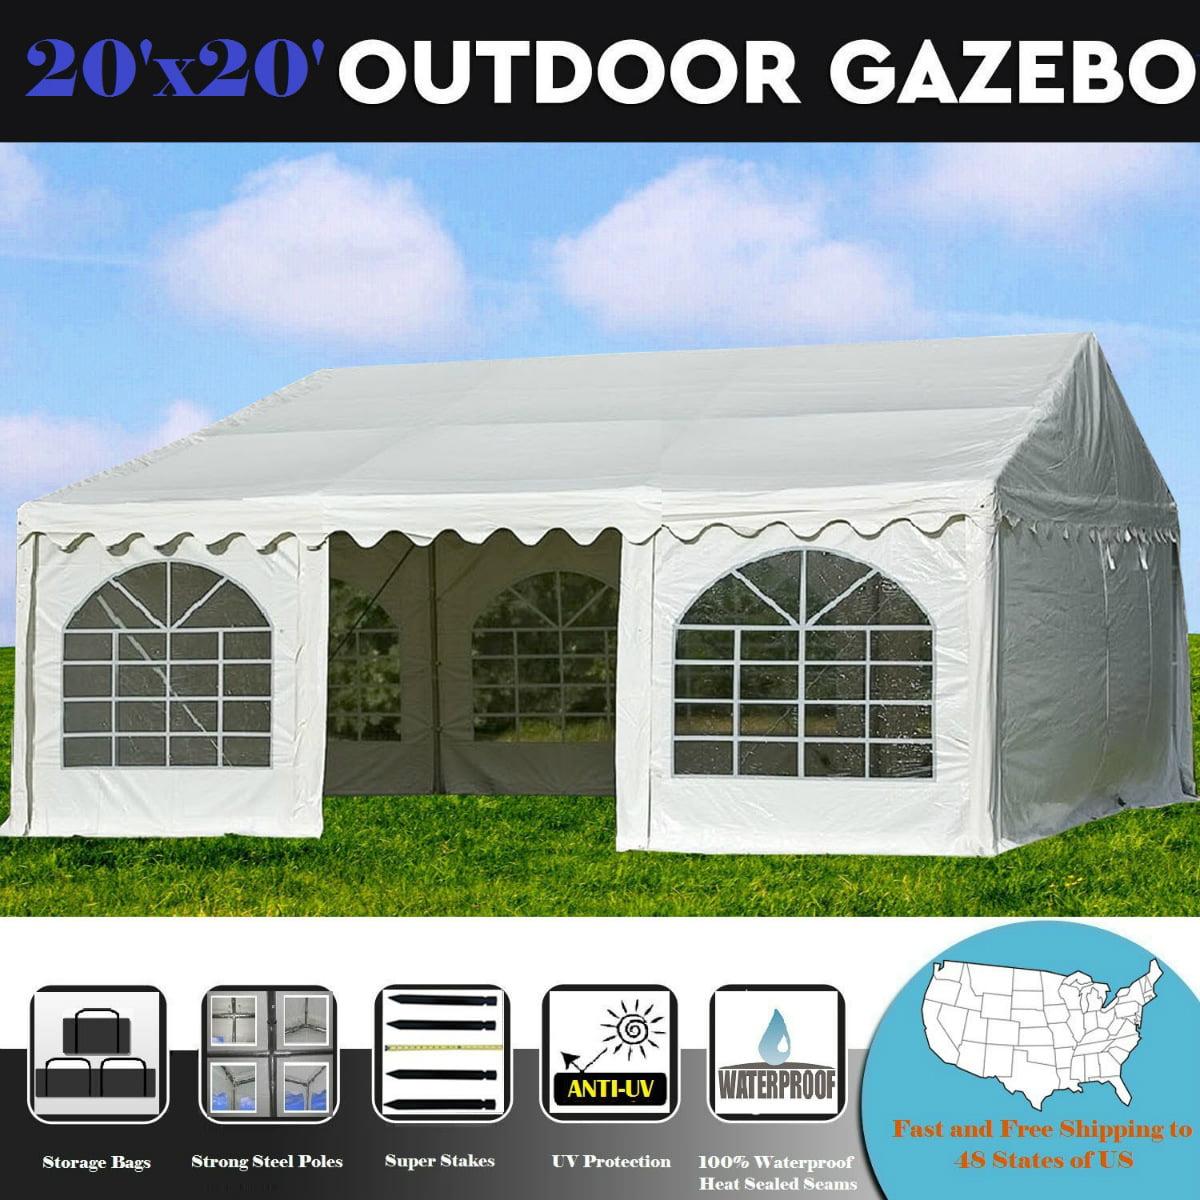 20'x20' PVC White Tent - Heavy Duty Wedding Party Tent Ca...